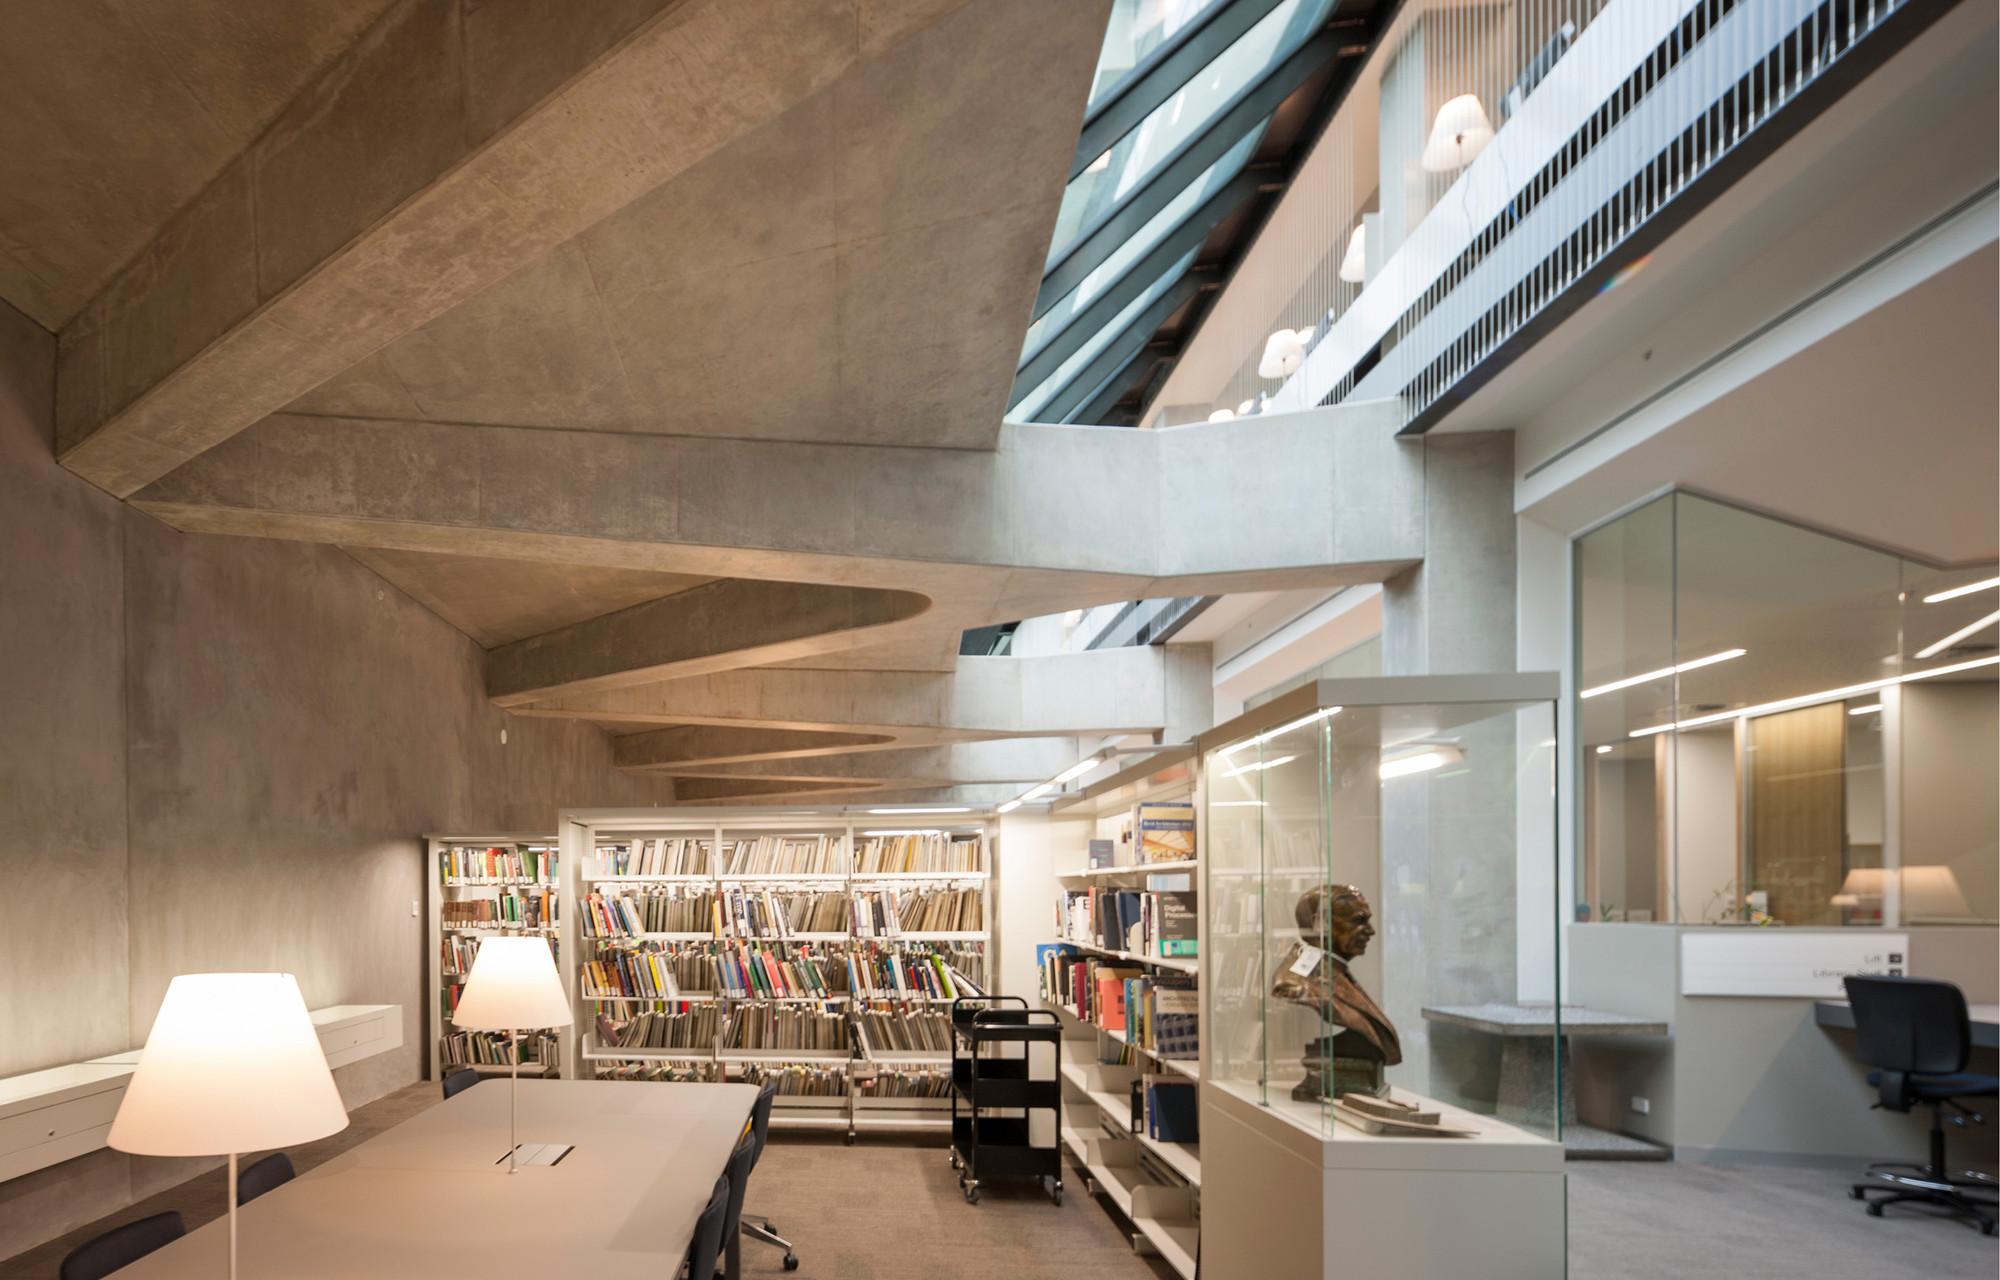 Melbourne School Of Design University MelbourneC John Horner